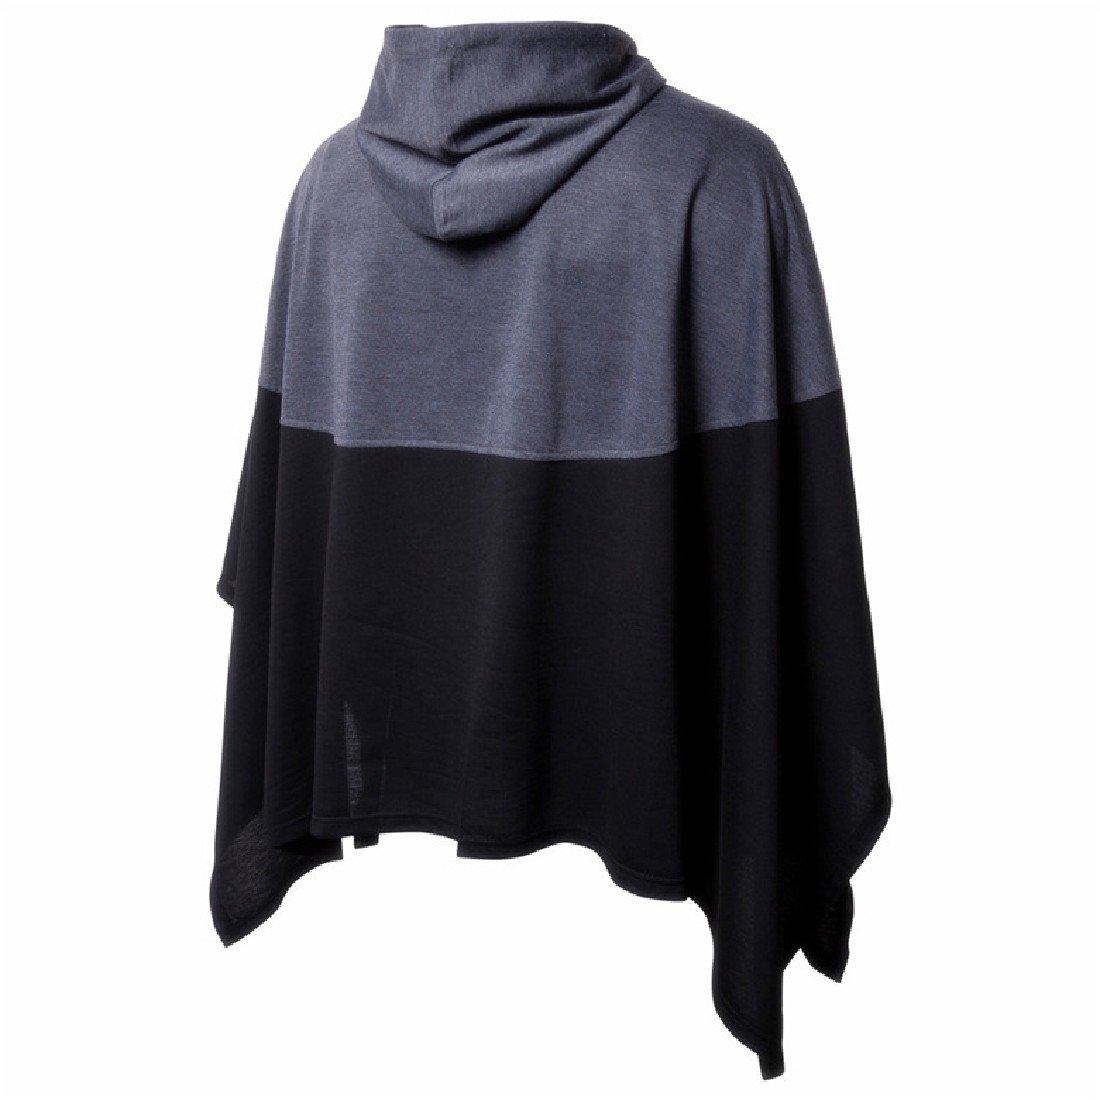 Nicelly Mens Outwear Casual Color Splice Cloak Sweatshirt Hoodies Jackets Dark Grey M